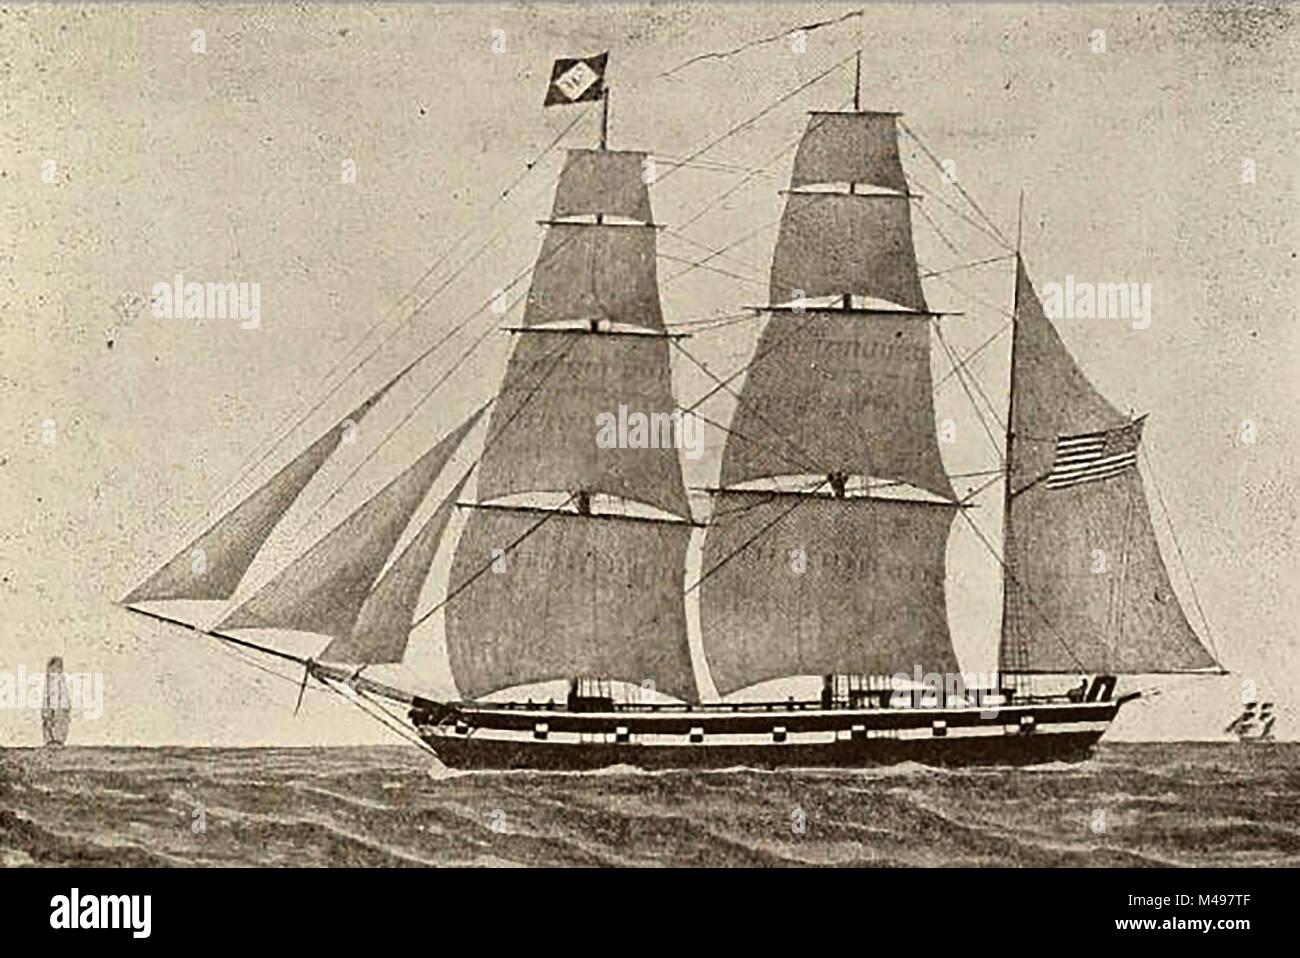 The American Bark ZOTOFF trader sailing ship  from Salem, built at Newbury, Mass. 20 tons - Stock Image